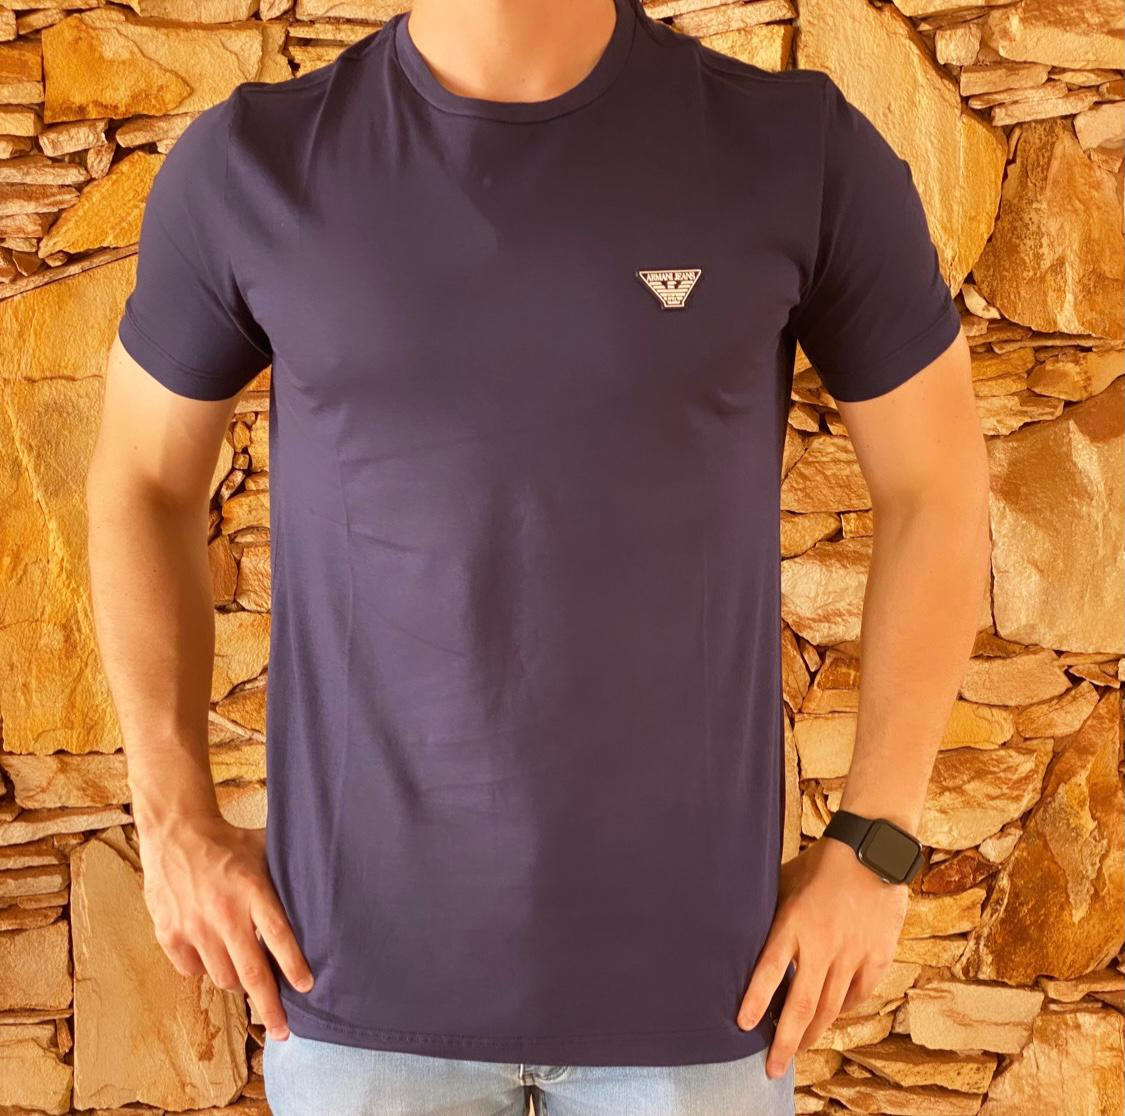 Camiseta Masculina Armani Exchange Algodão Lisa - Azul Marinho